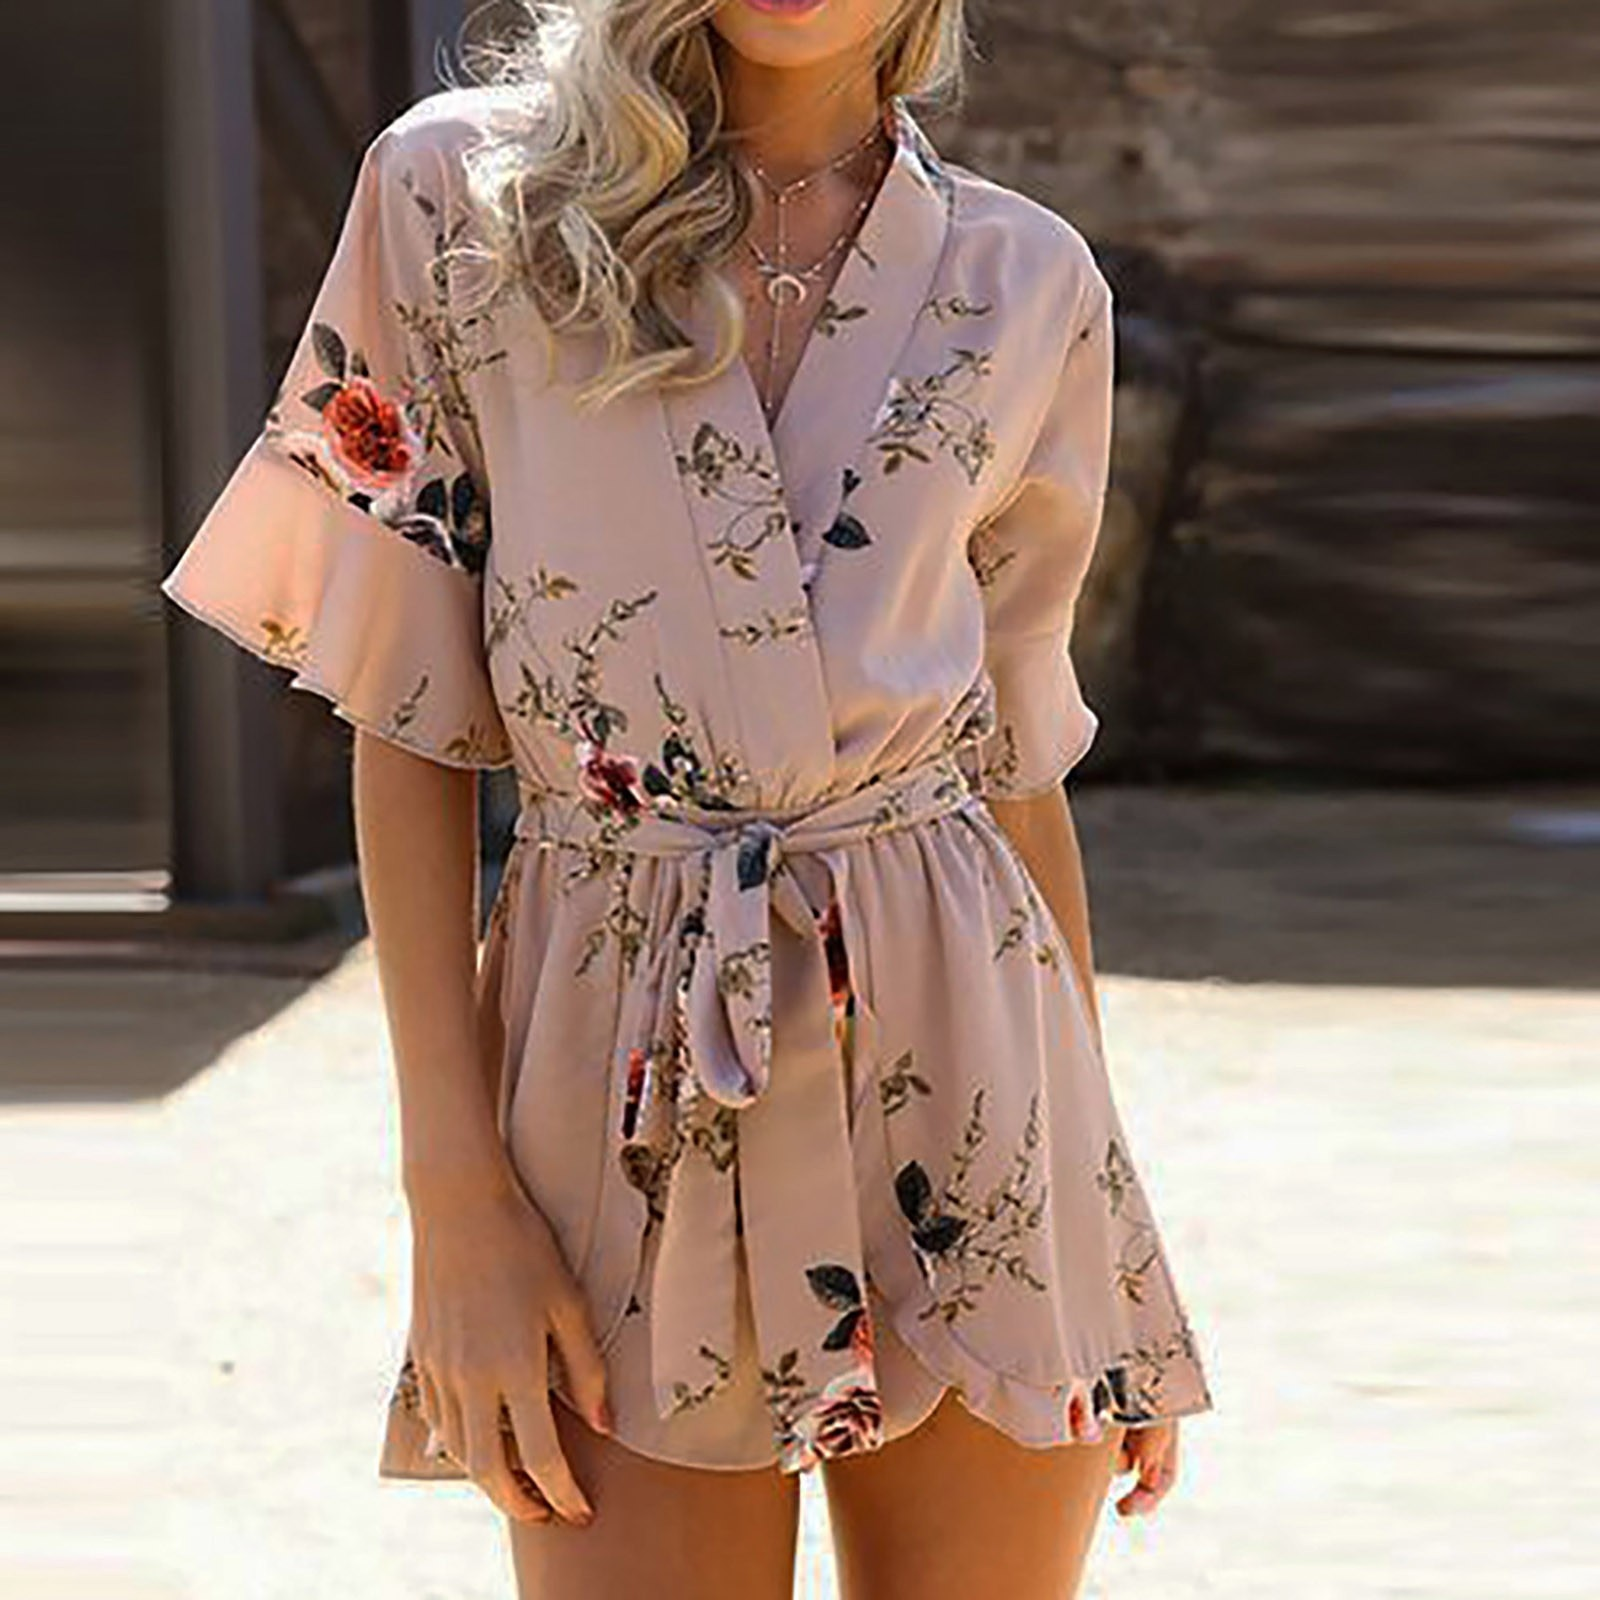 Boho Jumpsuit Women Summer Ruffles Sleeve V Neck Floral Print Sashes Playsuits Casual Loose Beach Sh